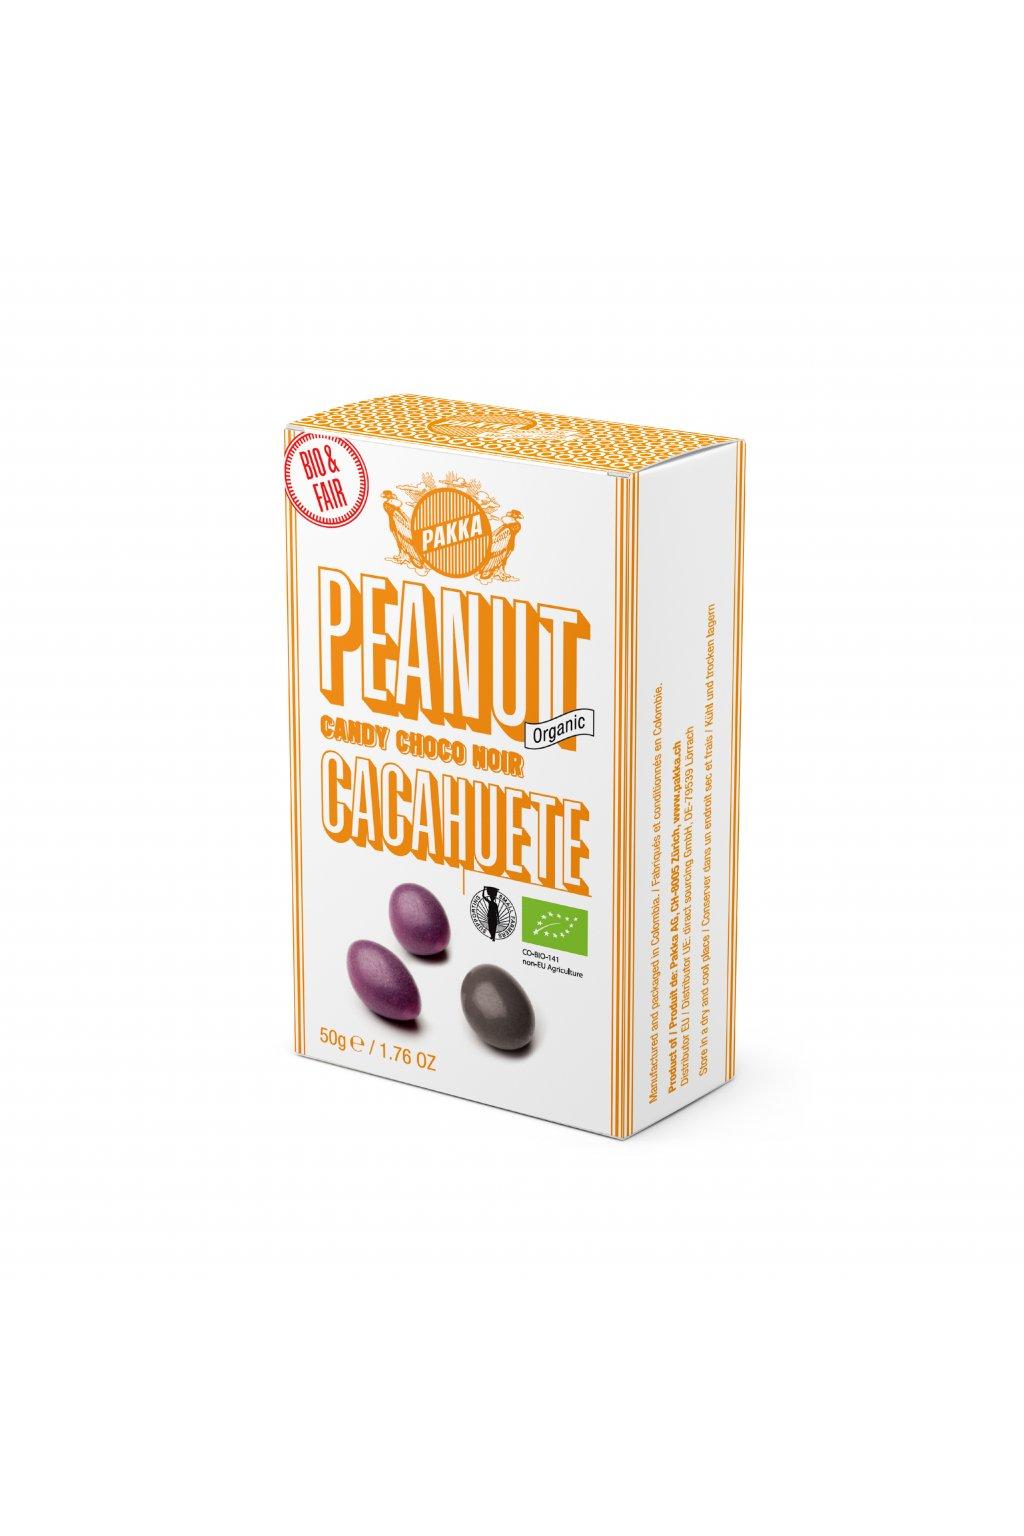 PAKKA Arasidy v horkej cokolade candy 50g web